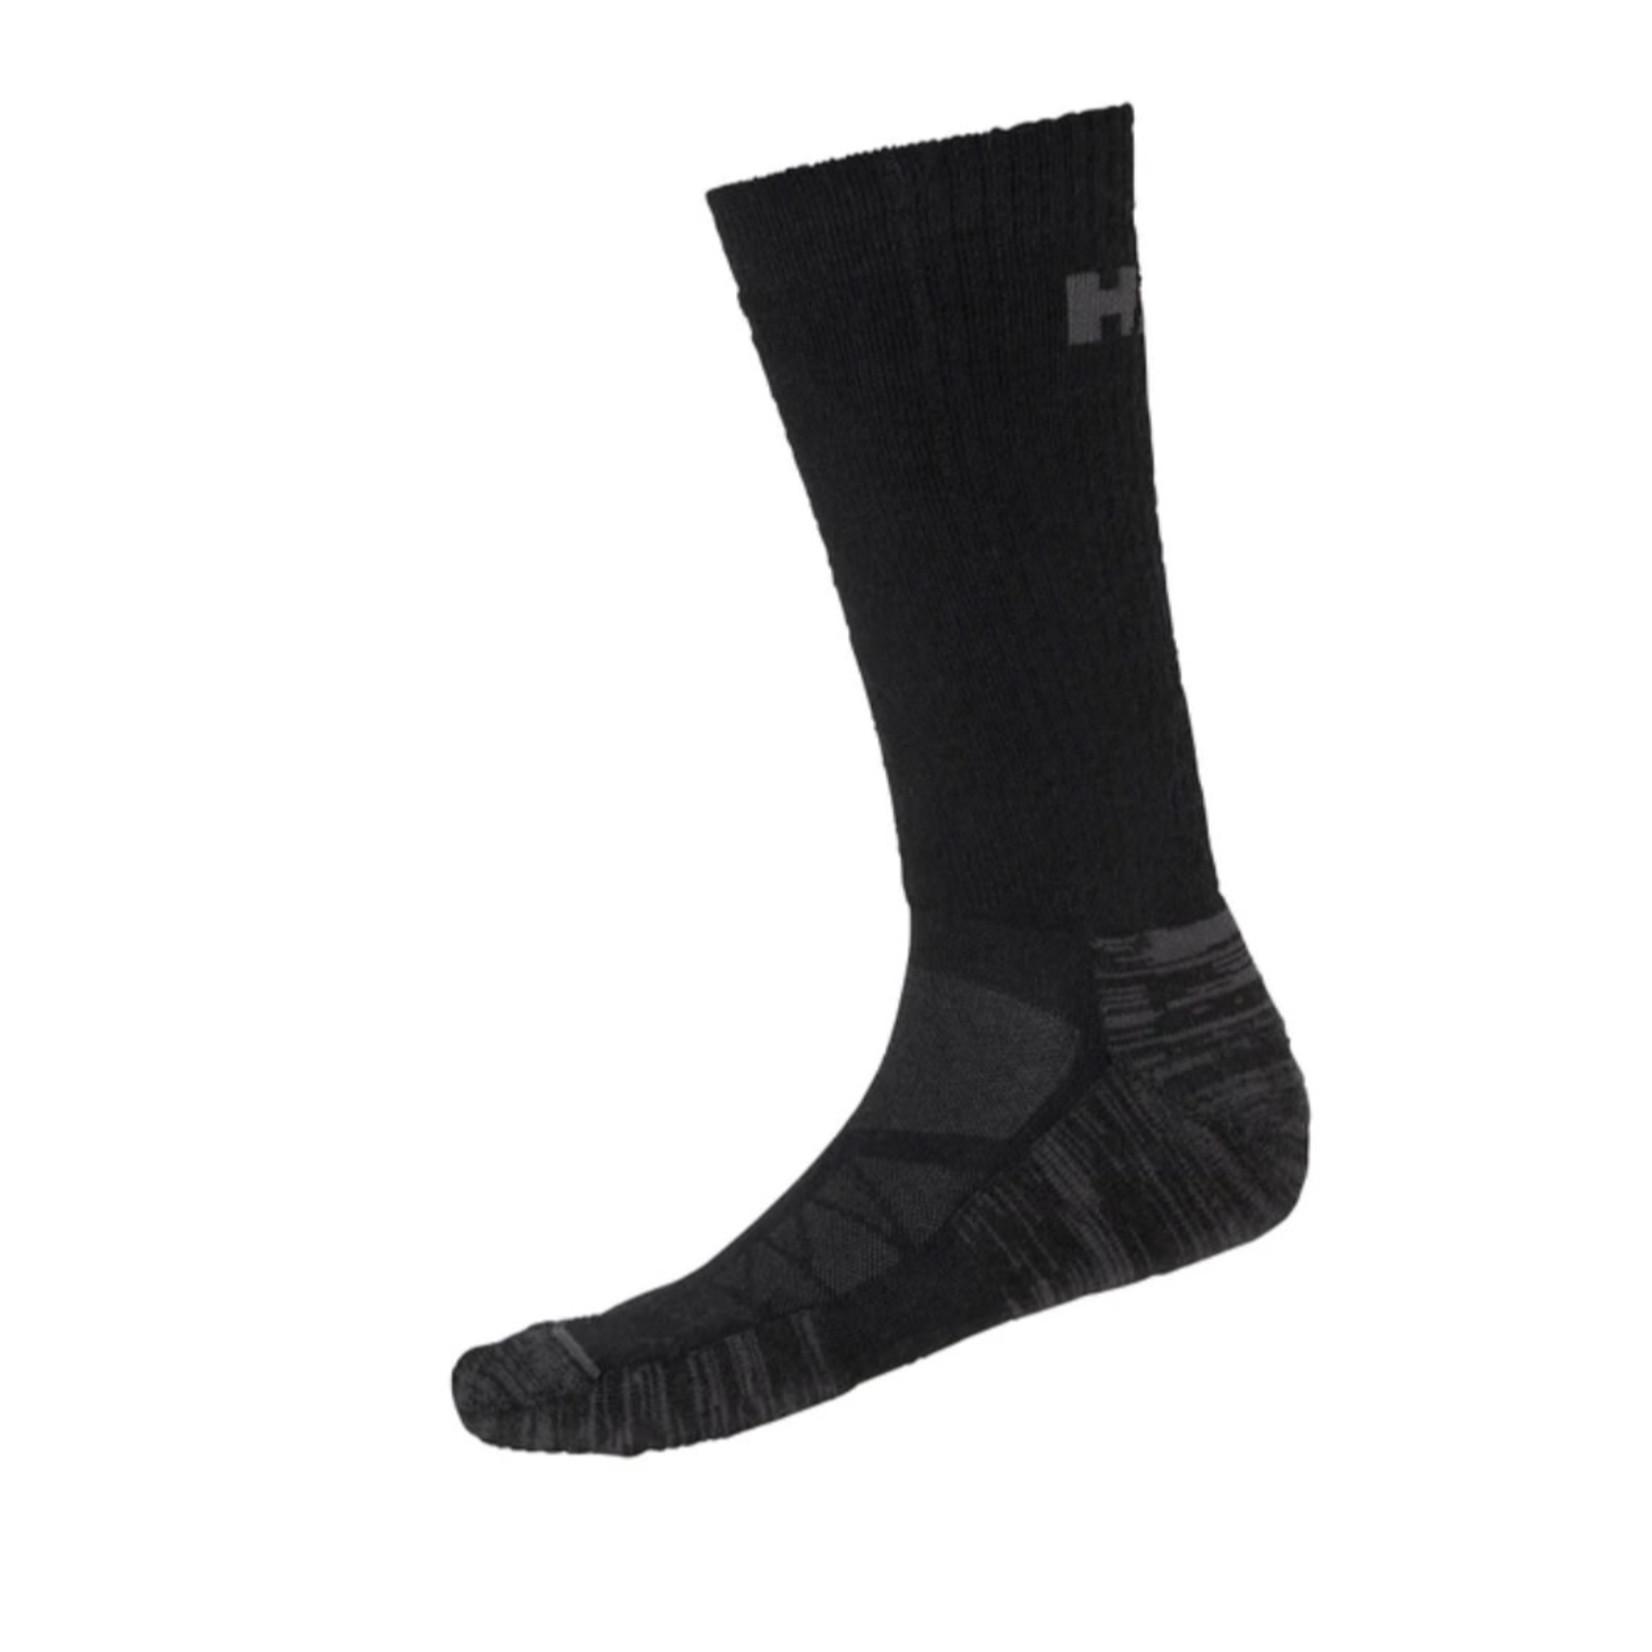 Helly Hansen Helly Hanson Oxford Insulated Winter Sock 79645 Black